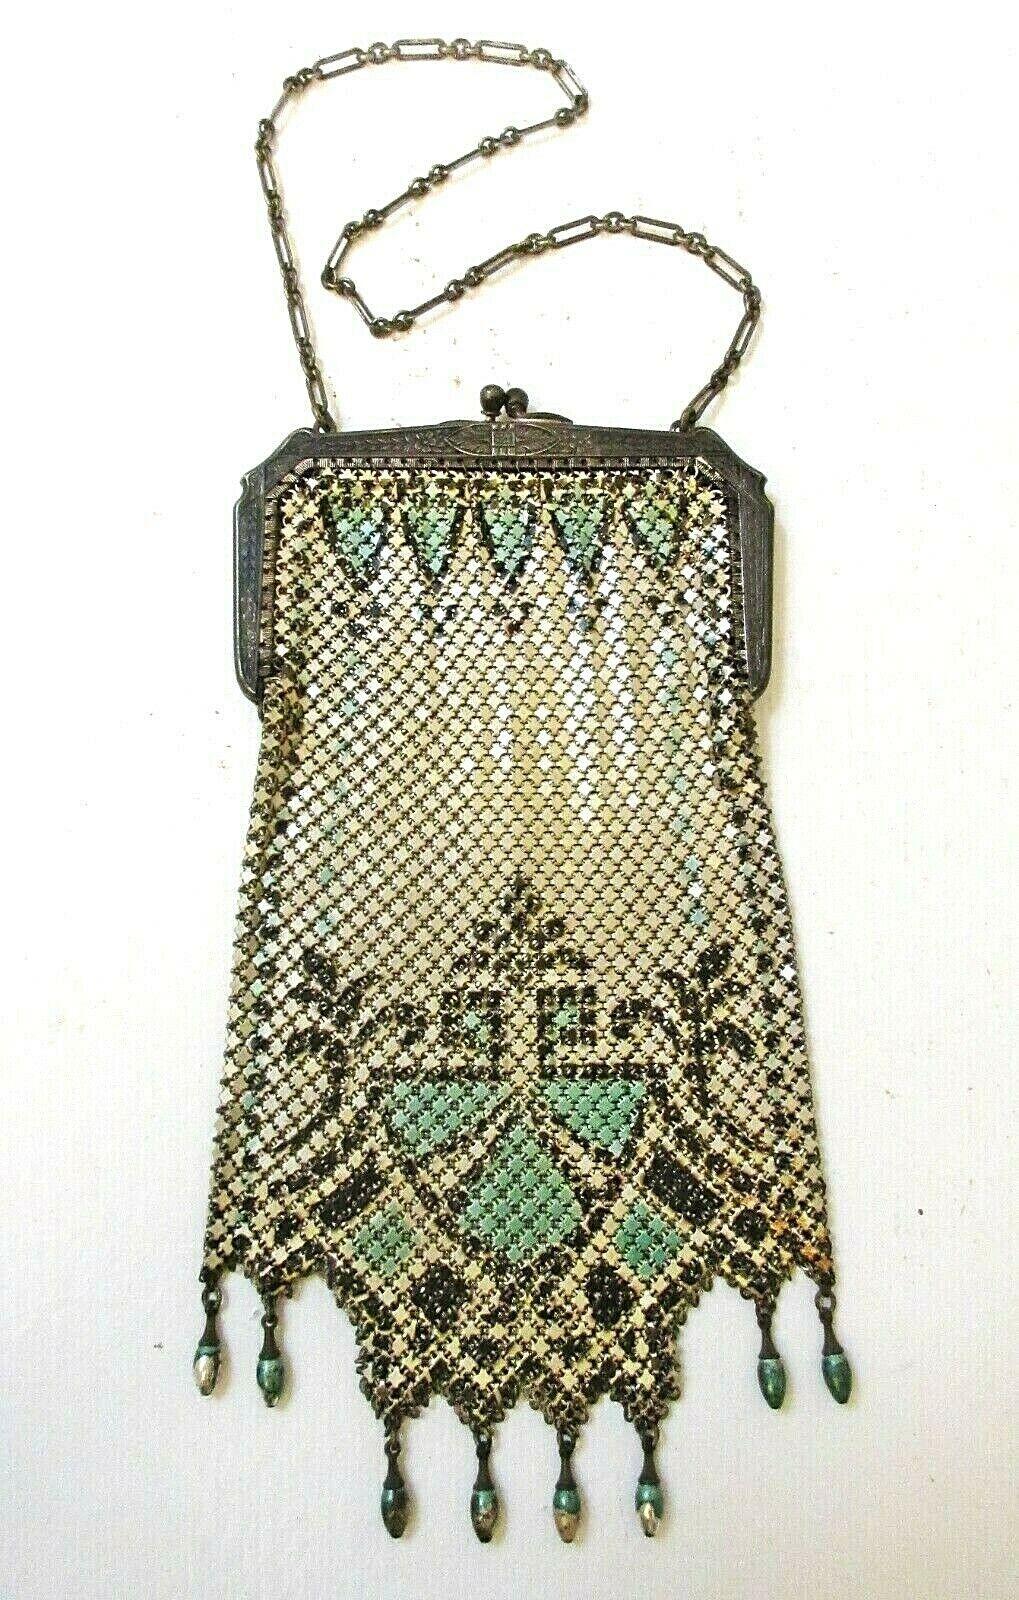 Antique Mandalian Mesh Enamel Purse 8 Drops Turqu… - image 1